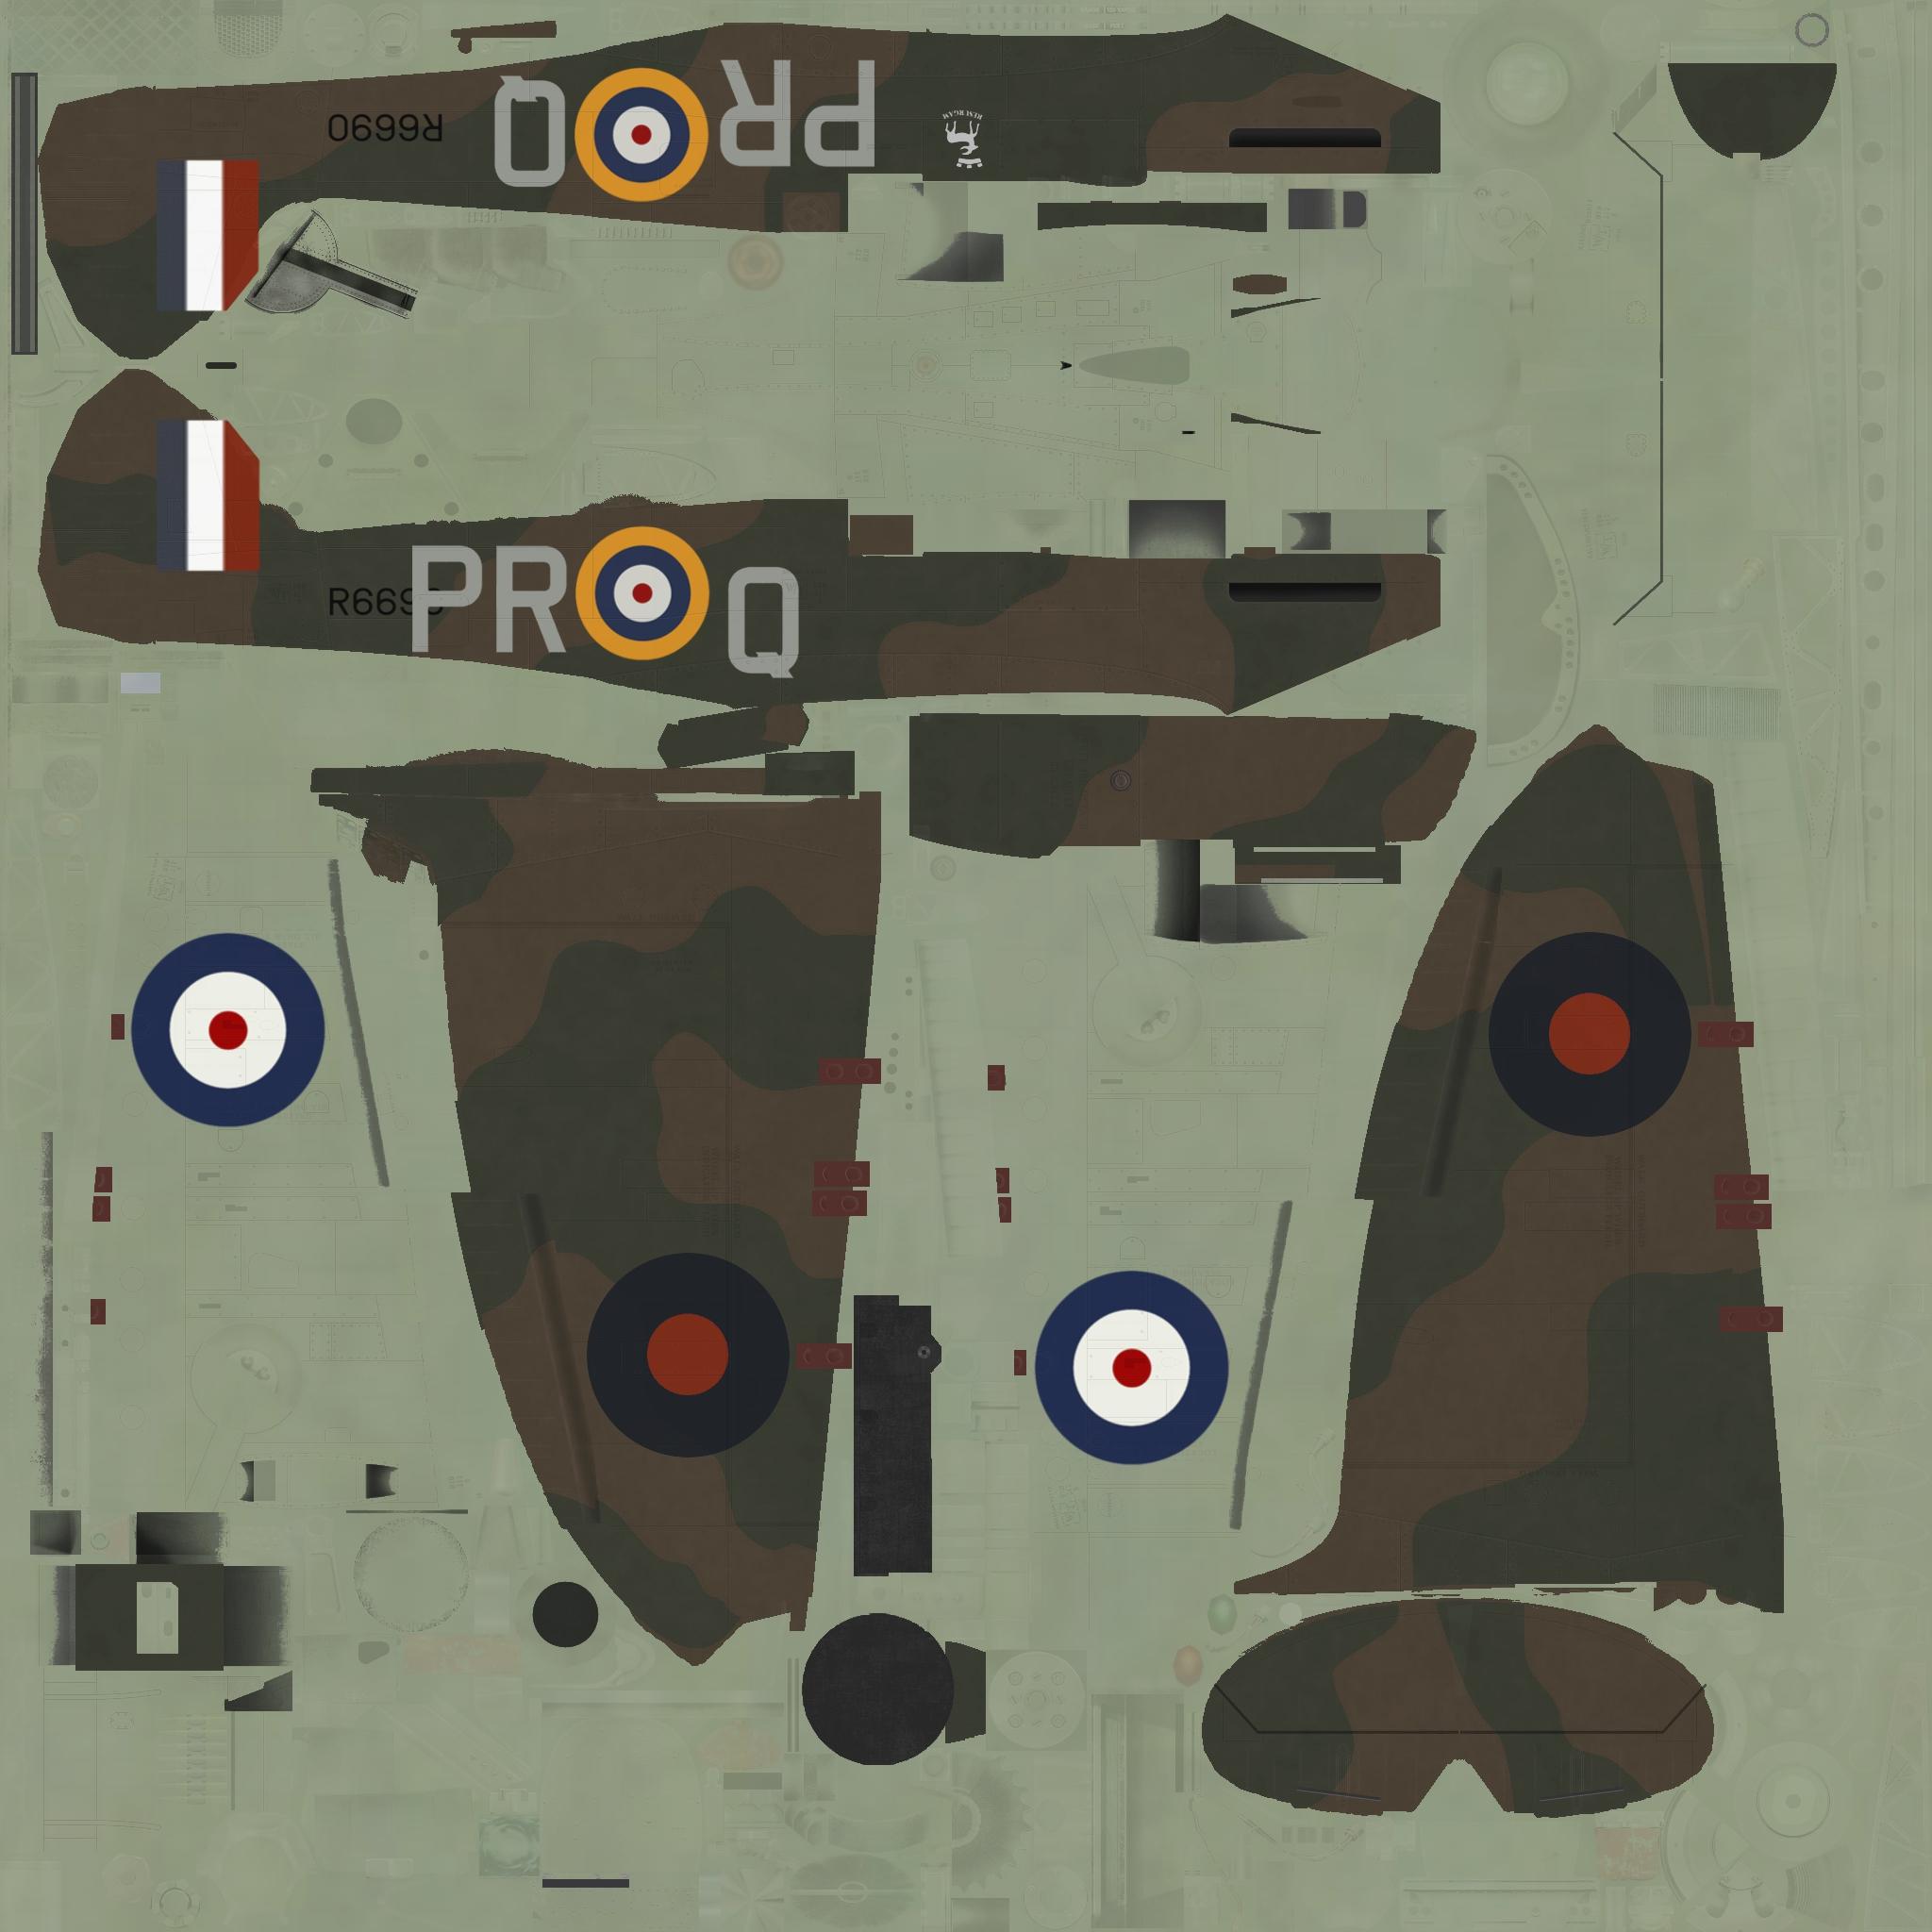 COD C6 MkI RAF 609Sqn PRQ John Dundas R6690 Middle Wallop 1940